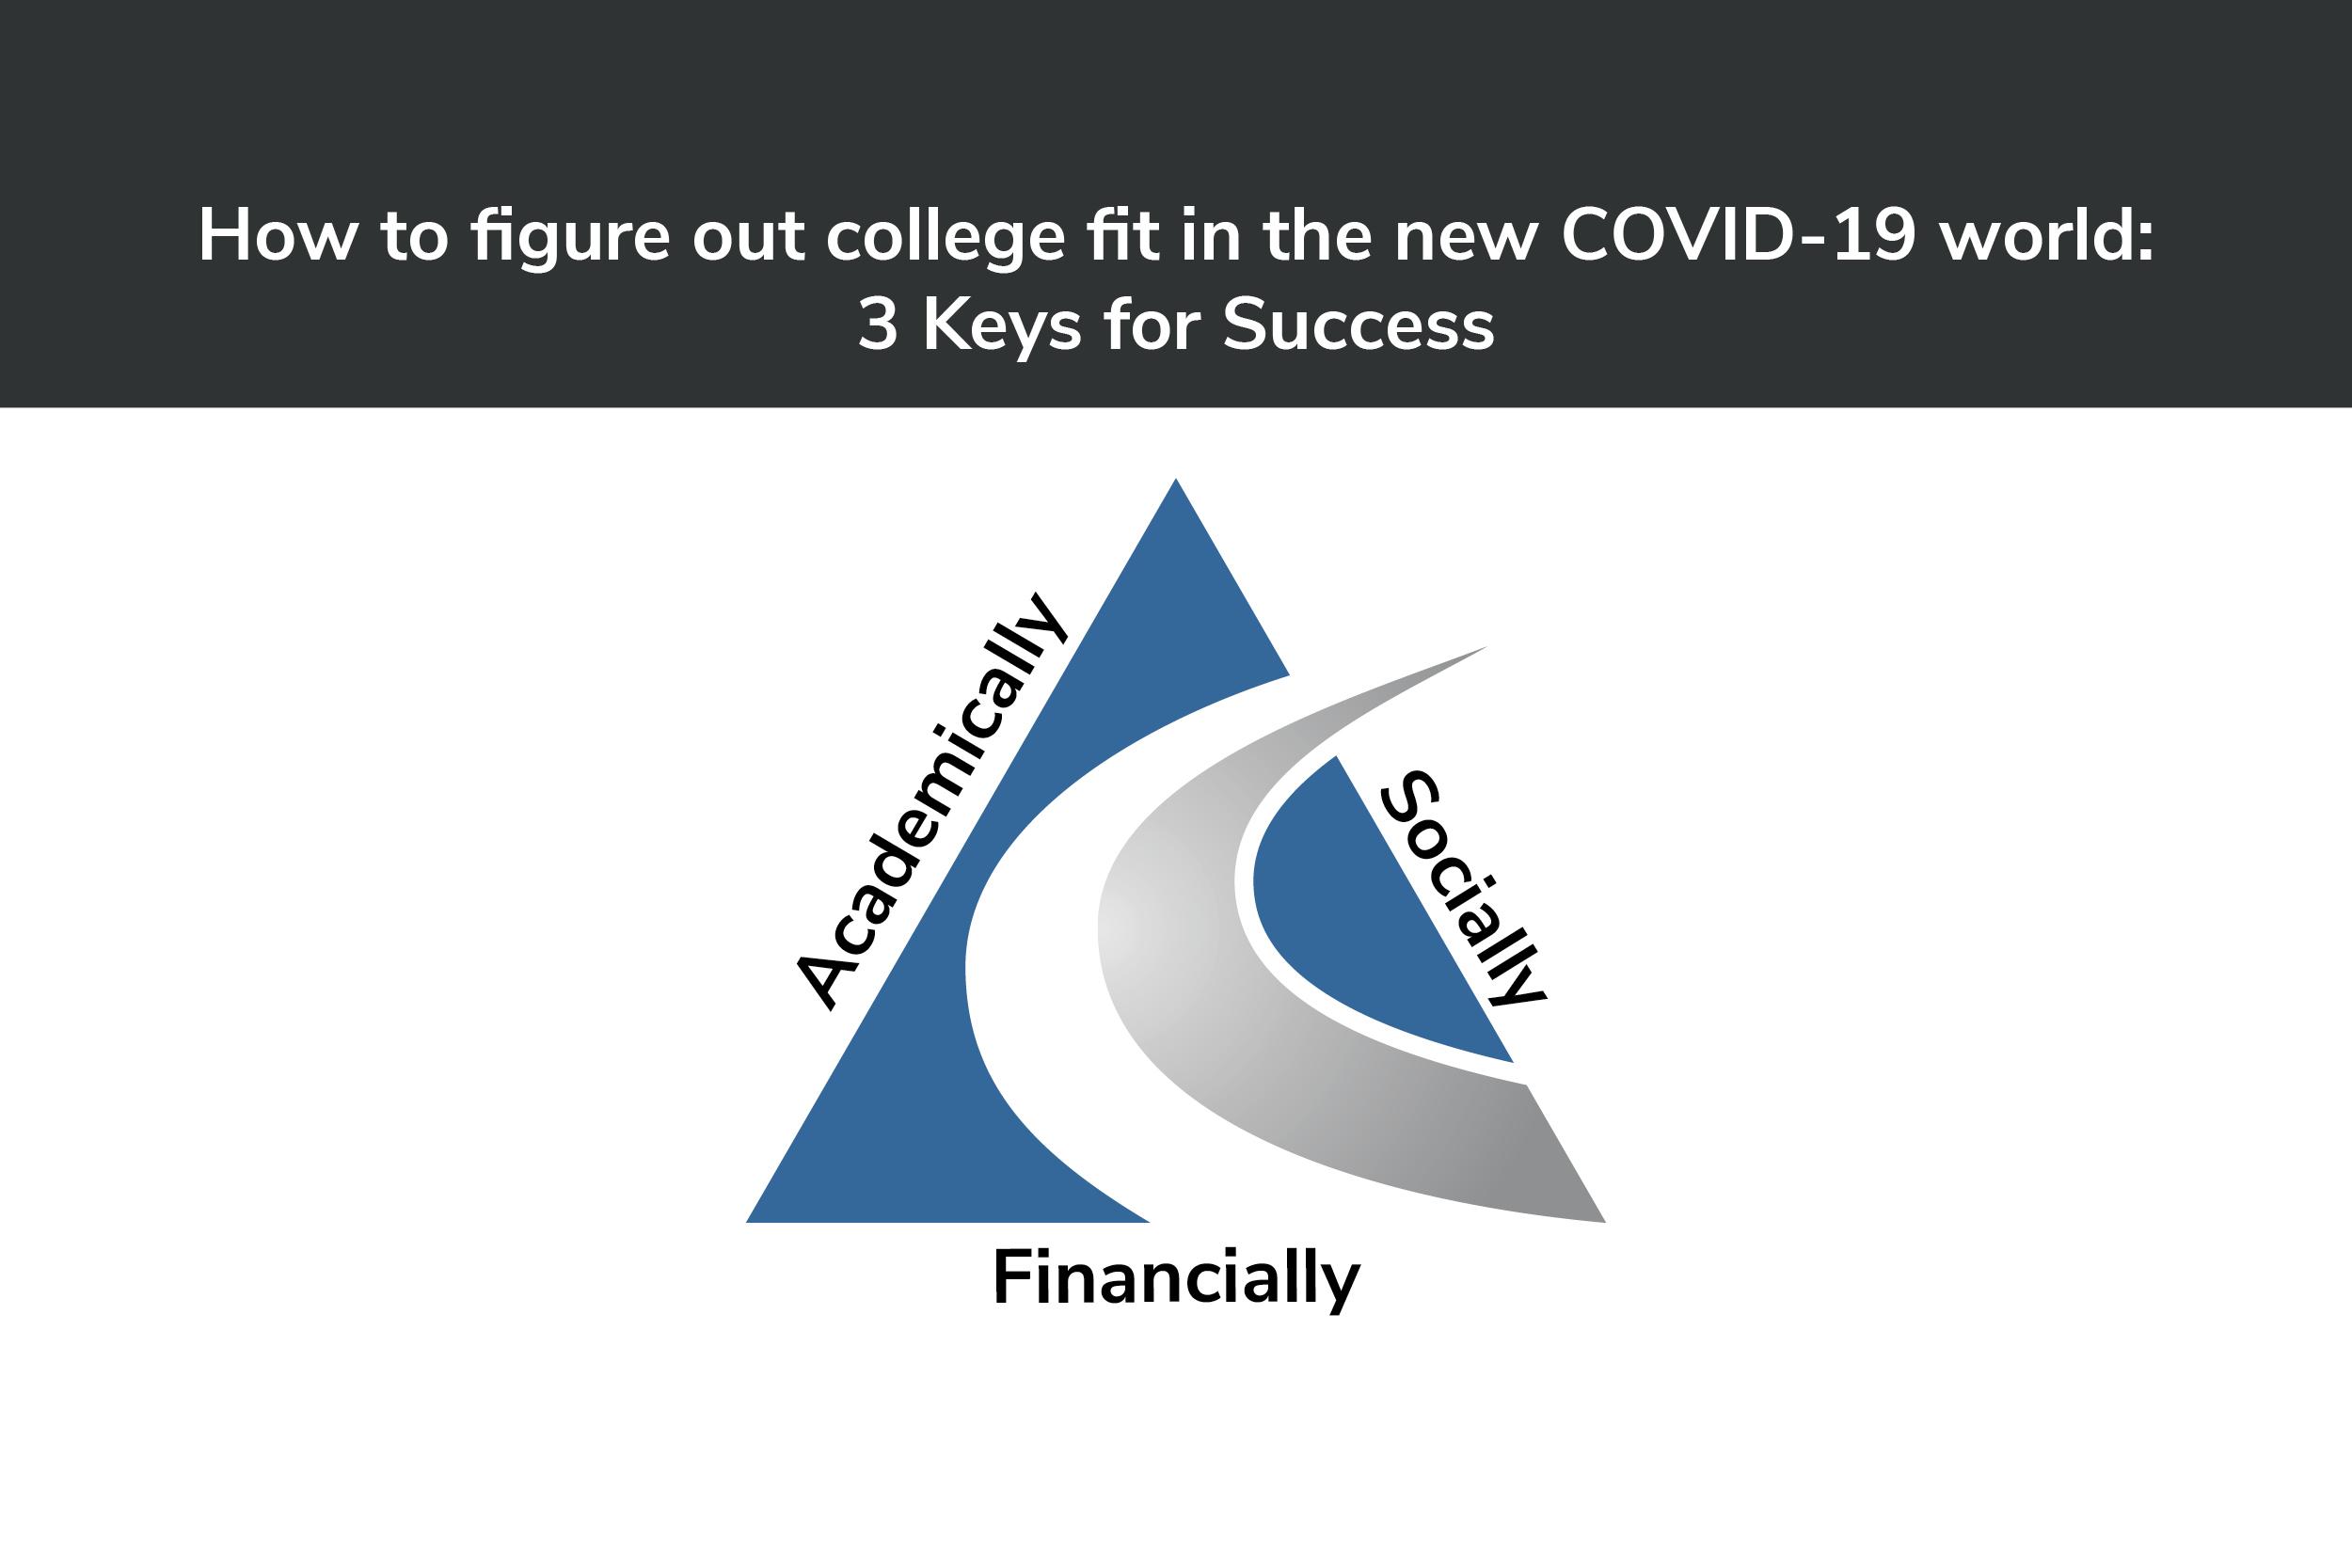 3 Keys For Success